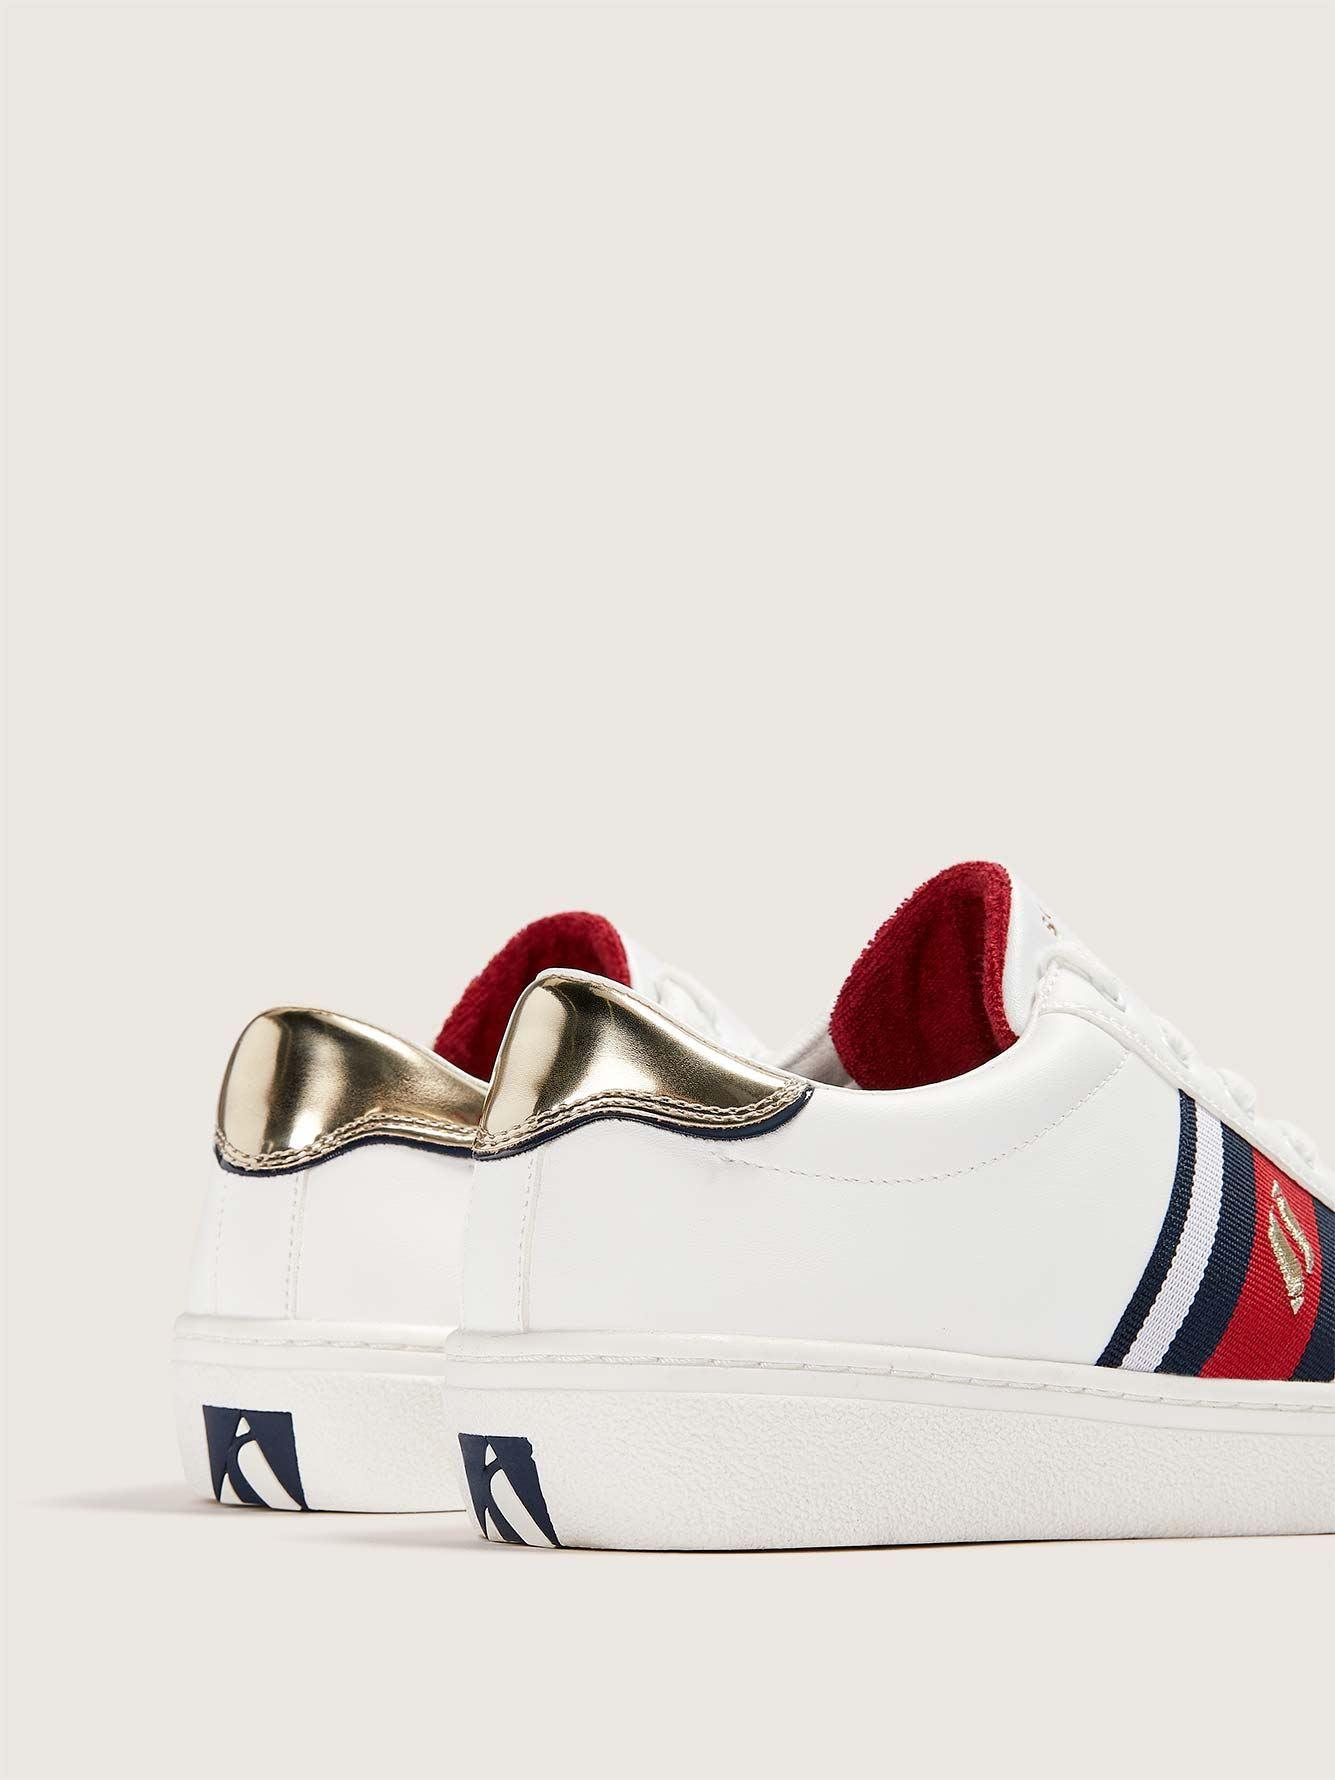 Skechers, Collegiate - Wide Width Lace Up Sneakers